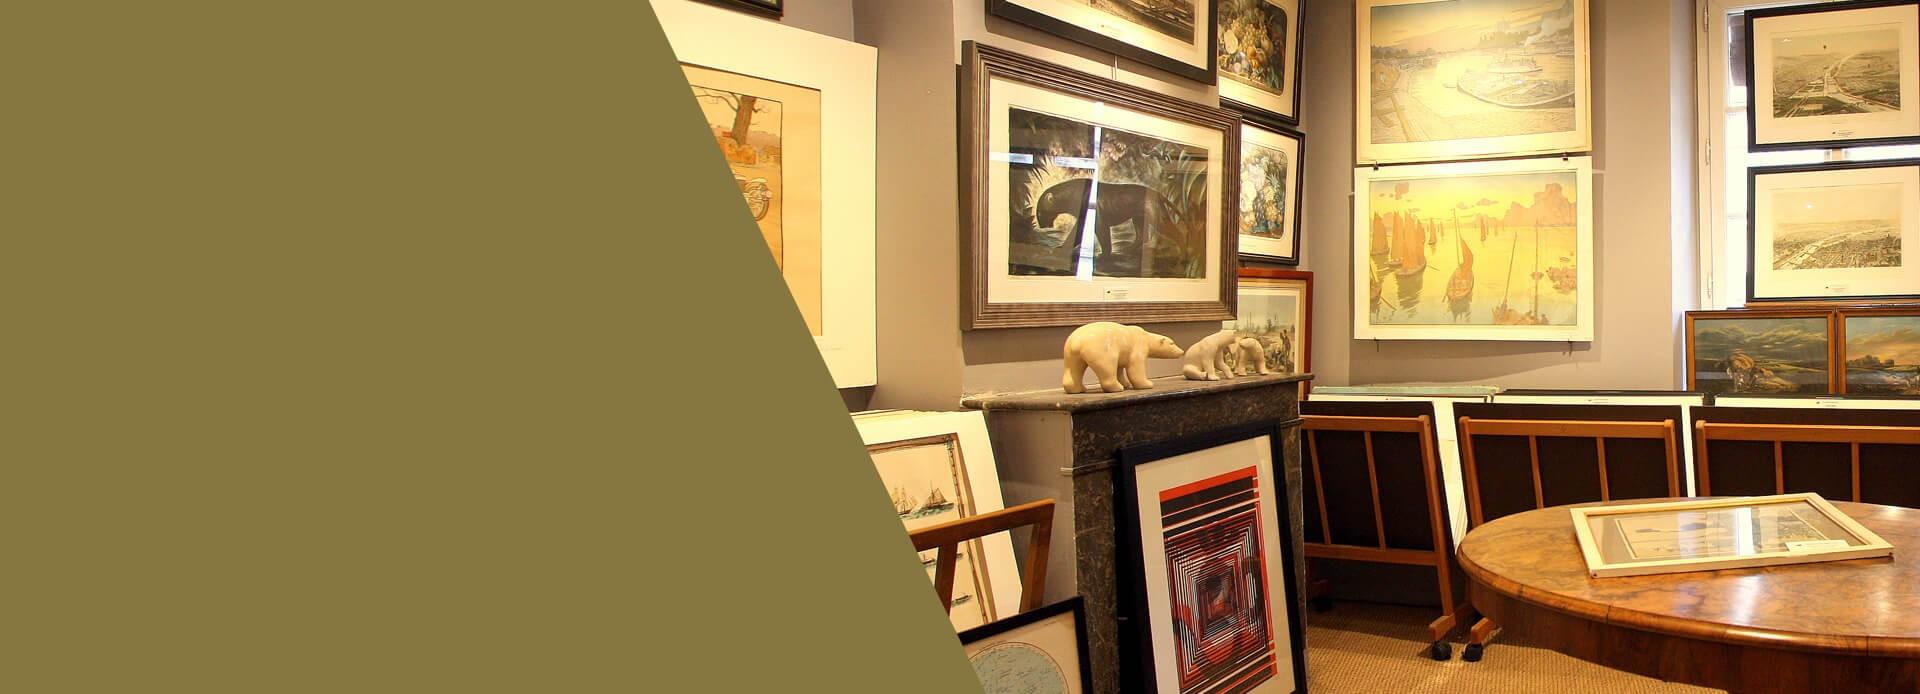 Galerie Martinez Fleurot